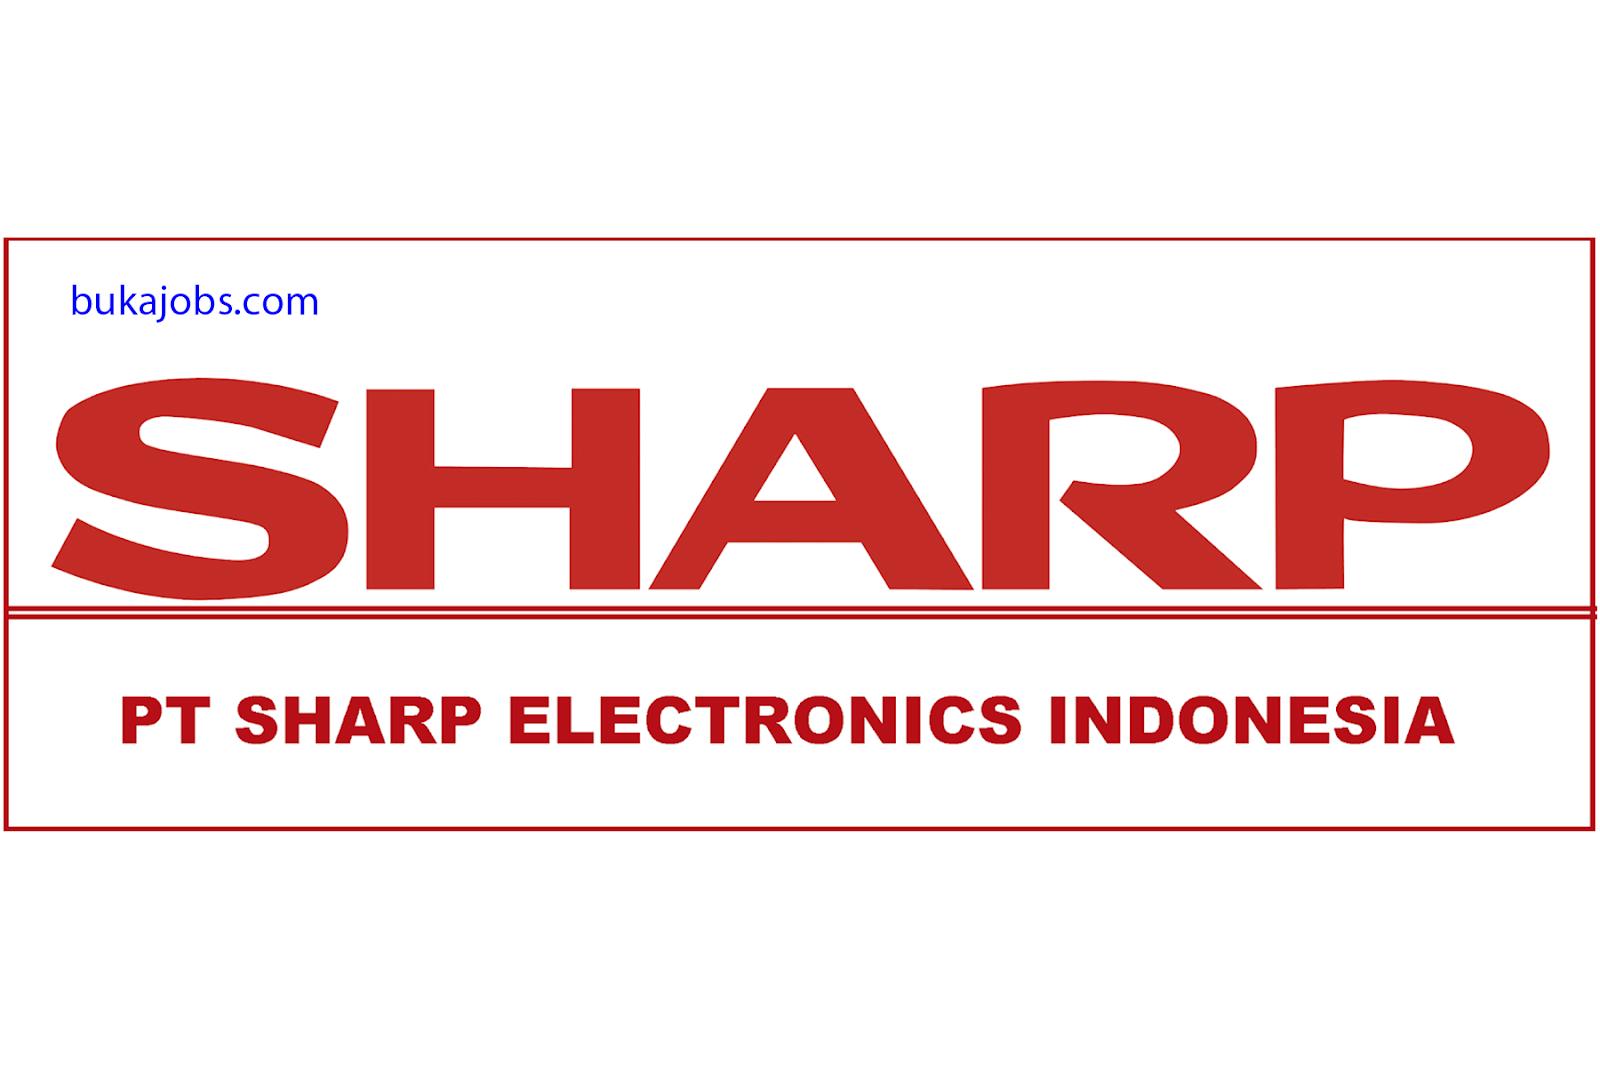 Lowongan Kerja PT Sharp Electronics Indonesia Januari 2019